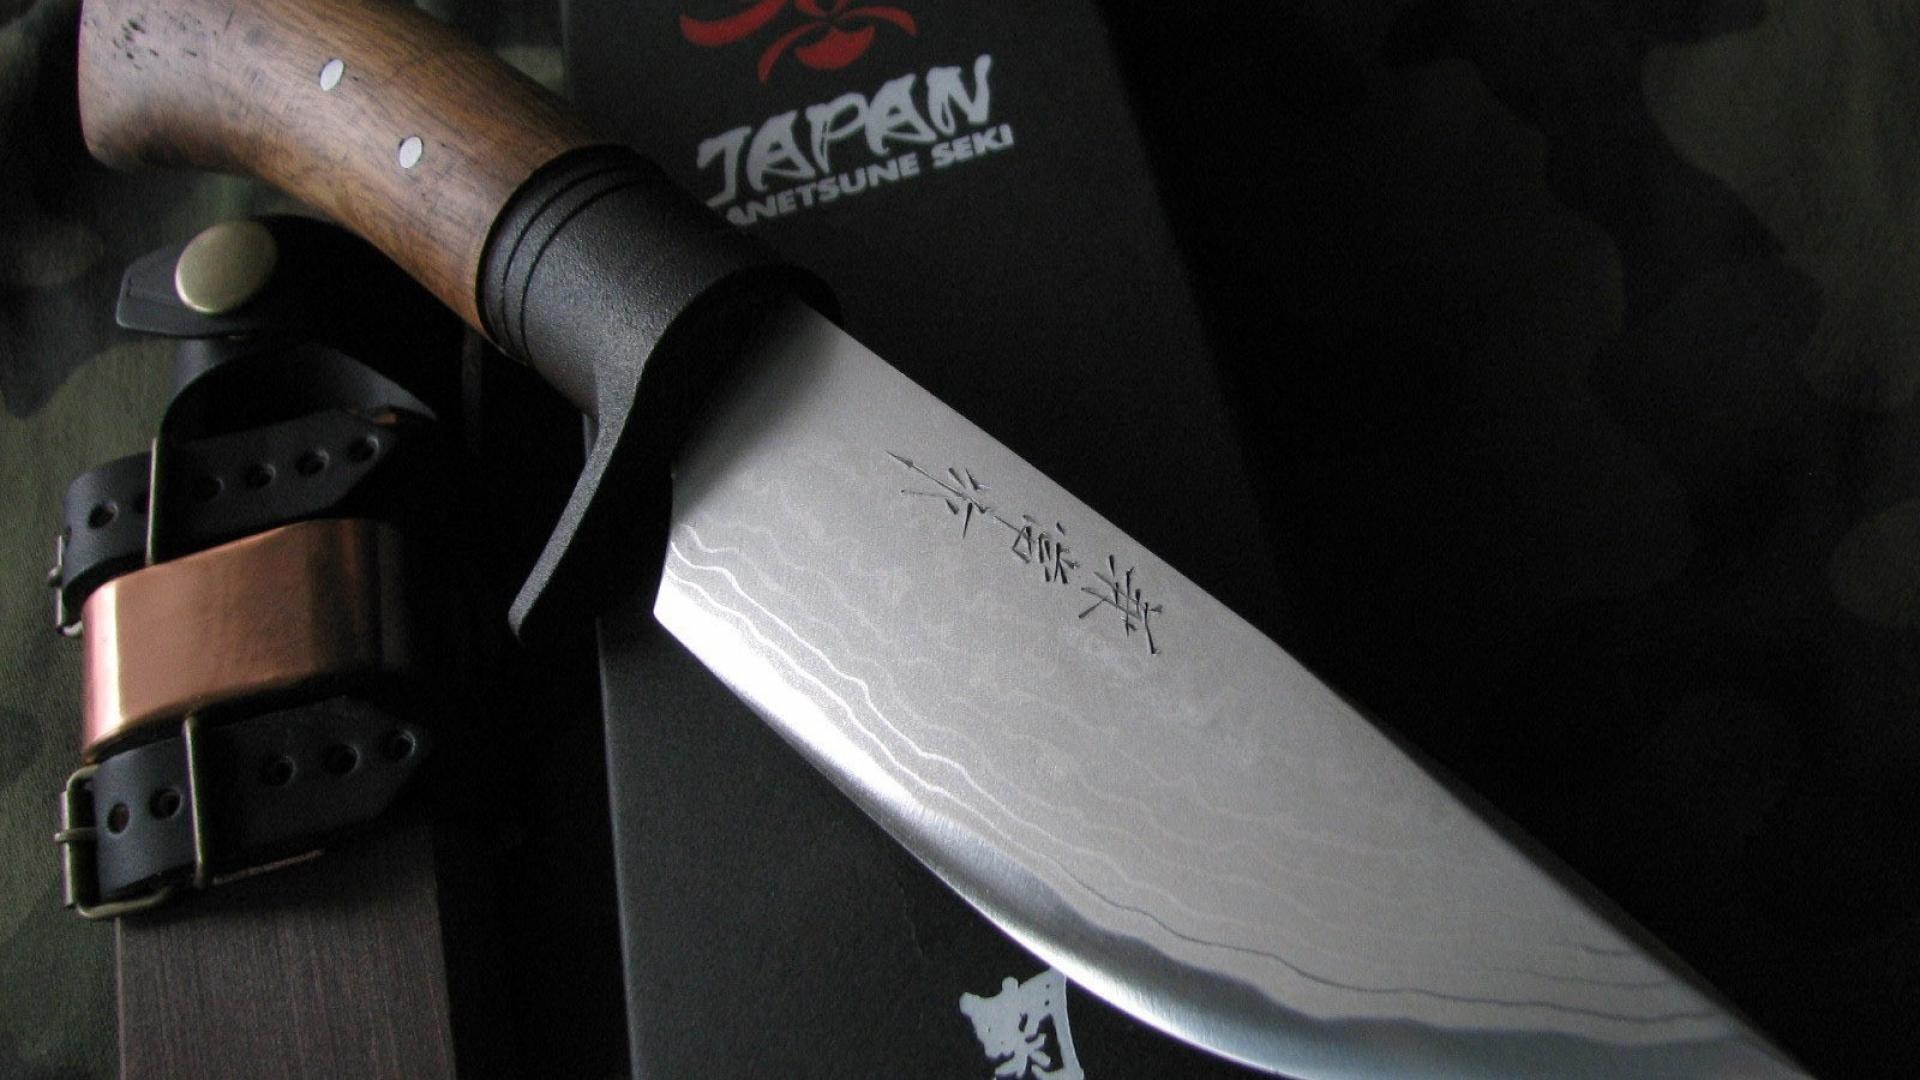 Knife wallpaper image hd